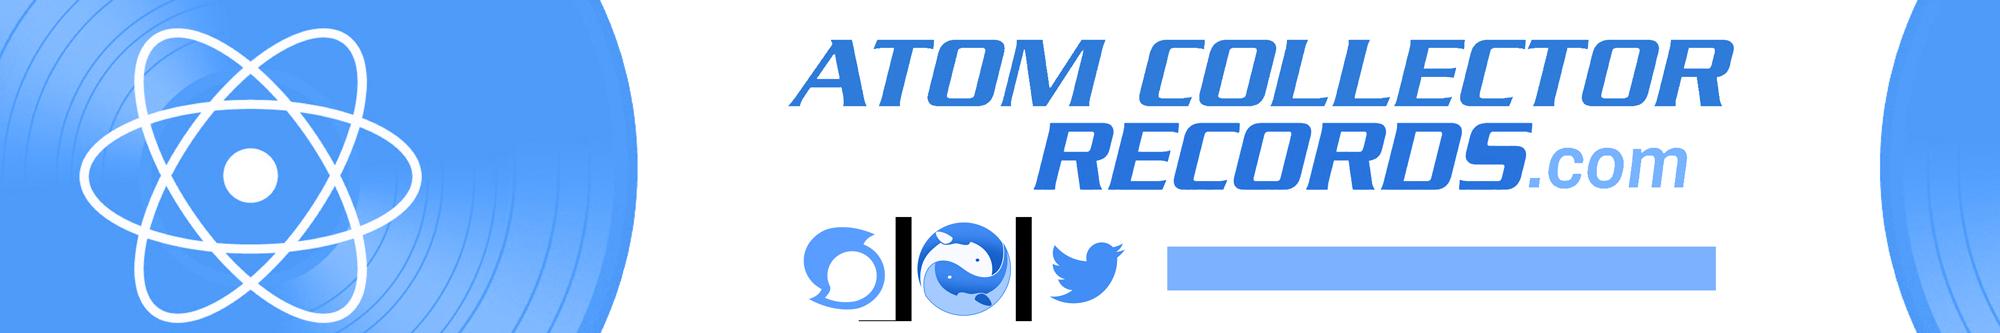 atomcollector-signature.png